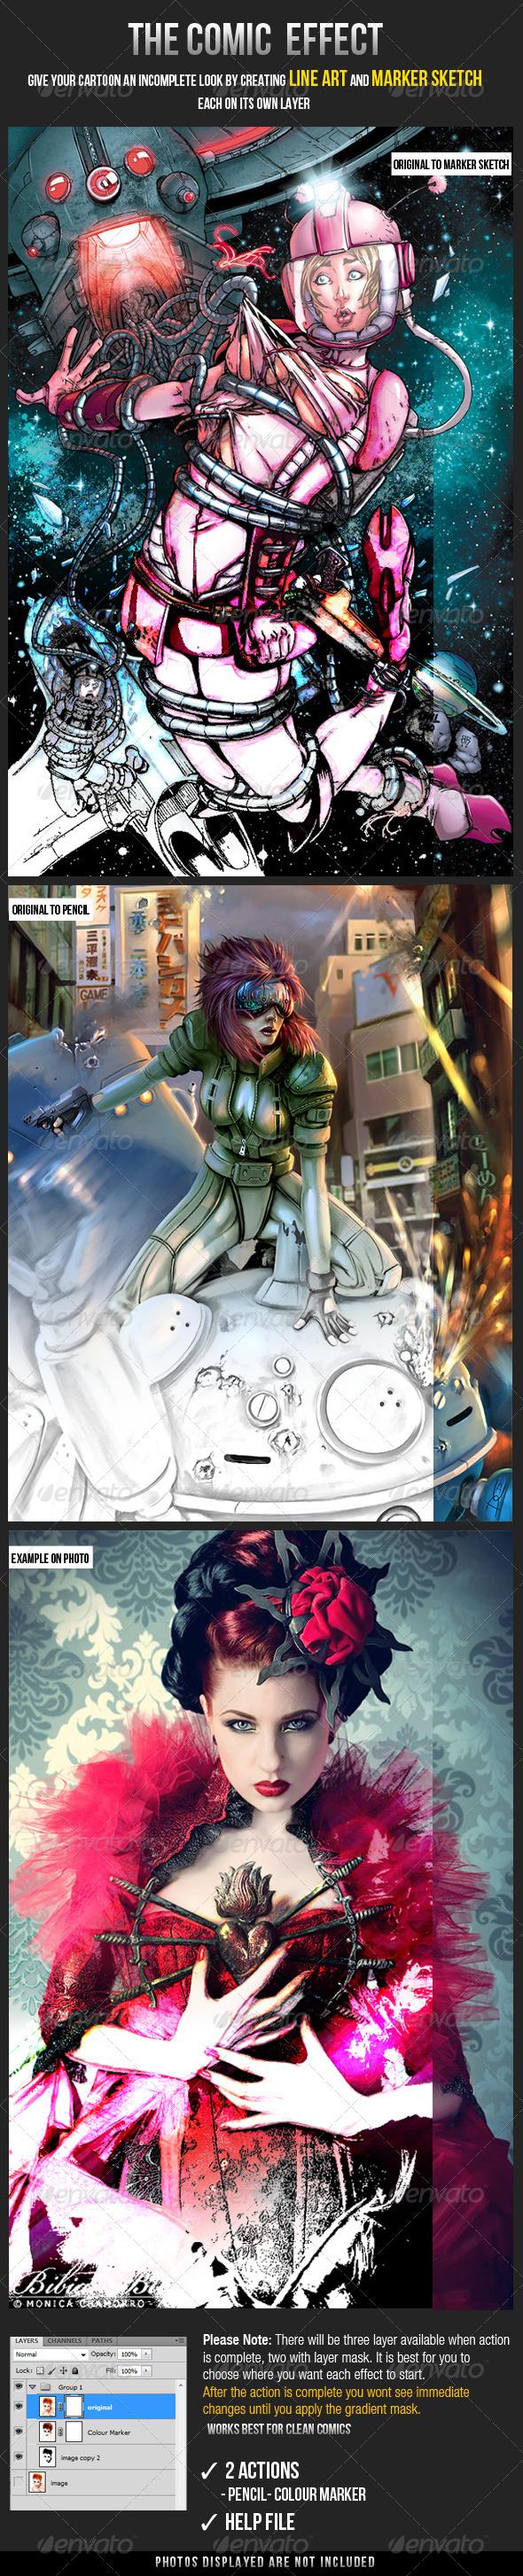 GraphicRiver The Comic Effect 3097503